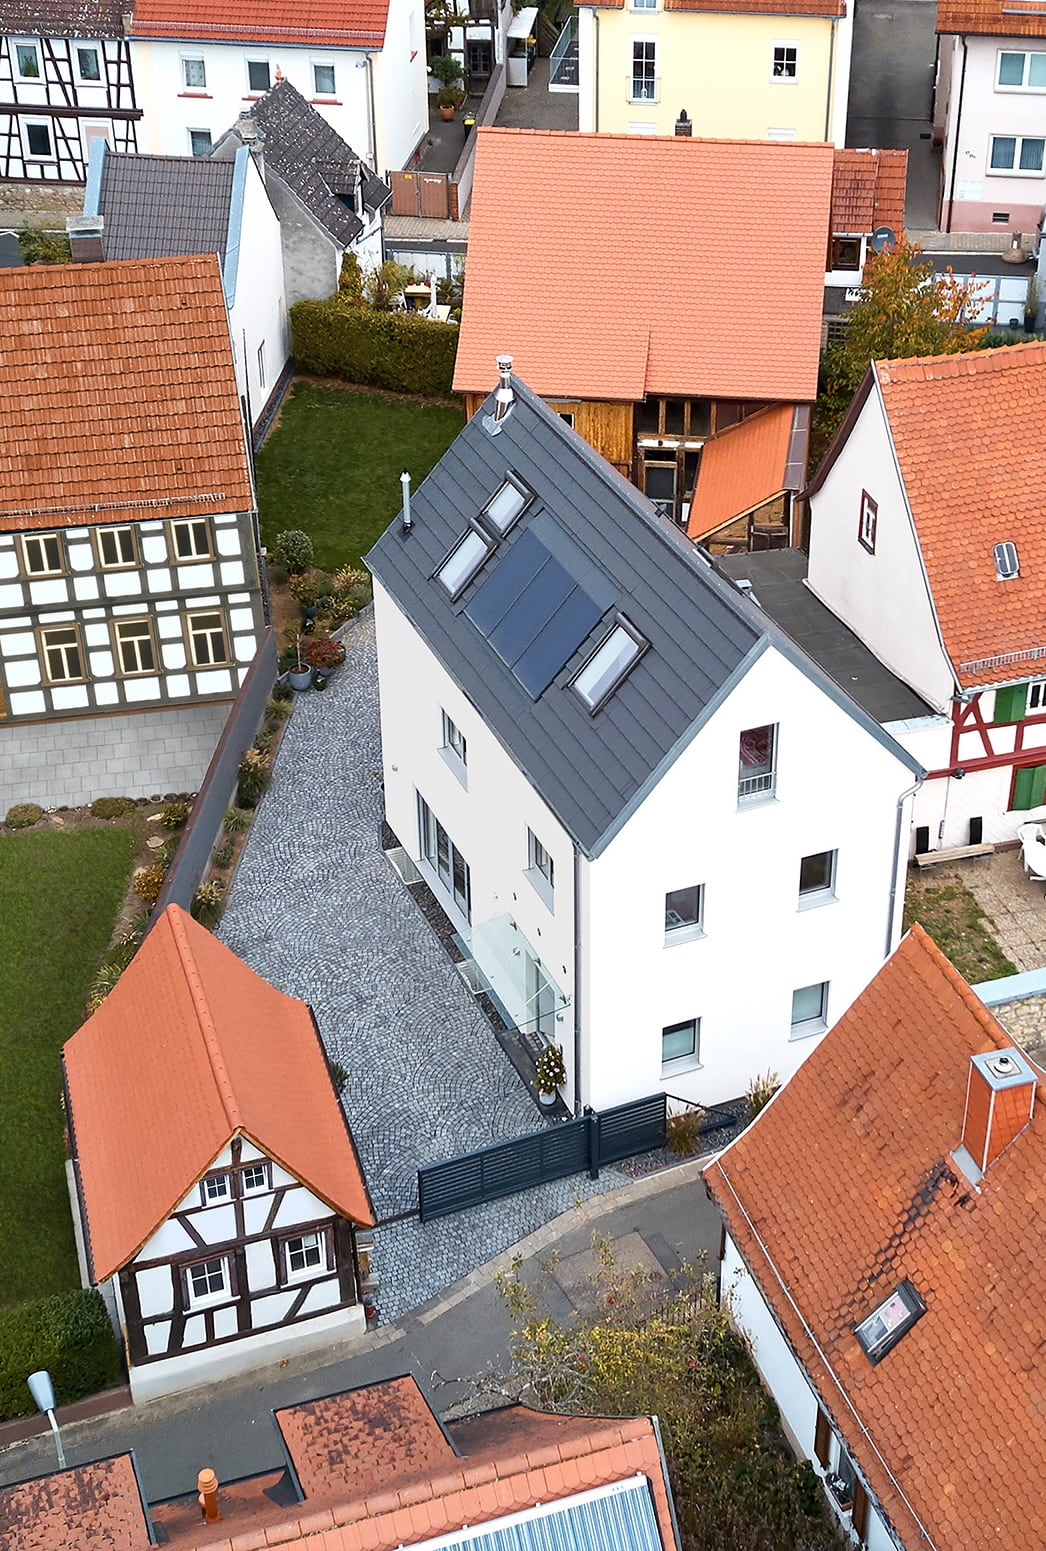 Modernes Stadthaus mit Satteldach & Putz Fassade - Fertighaus bauen Ideen ökologisches Baufritz Haus STADTHAUS EHRMANN - HausbauDirekt.de